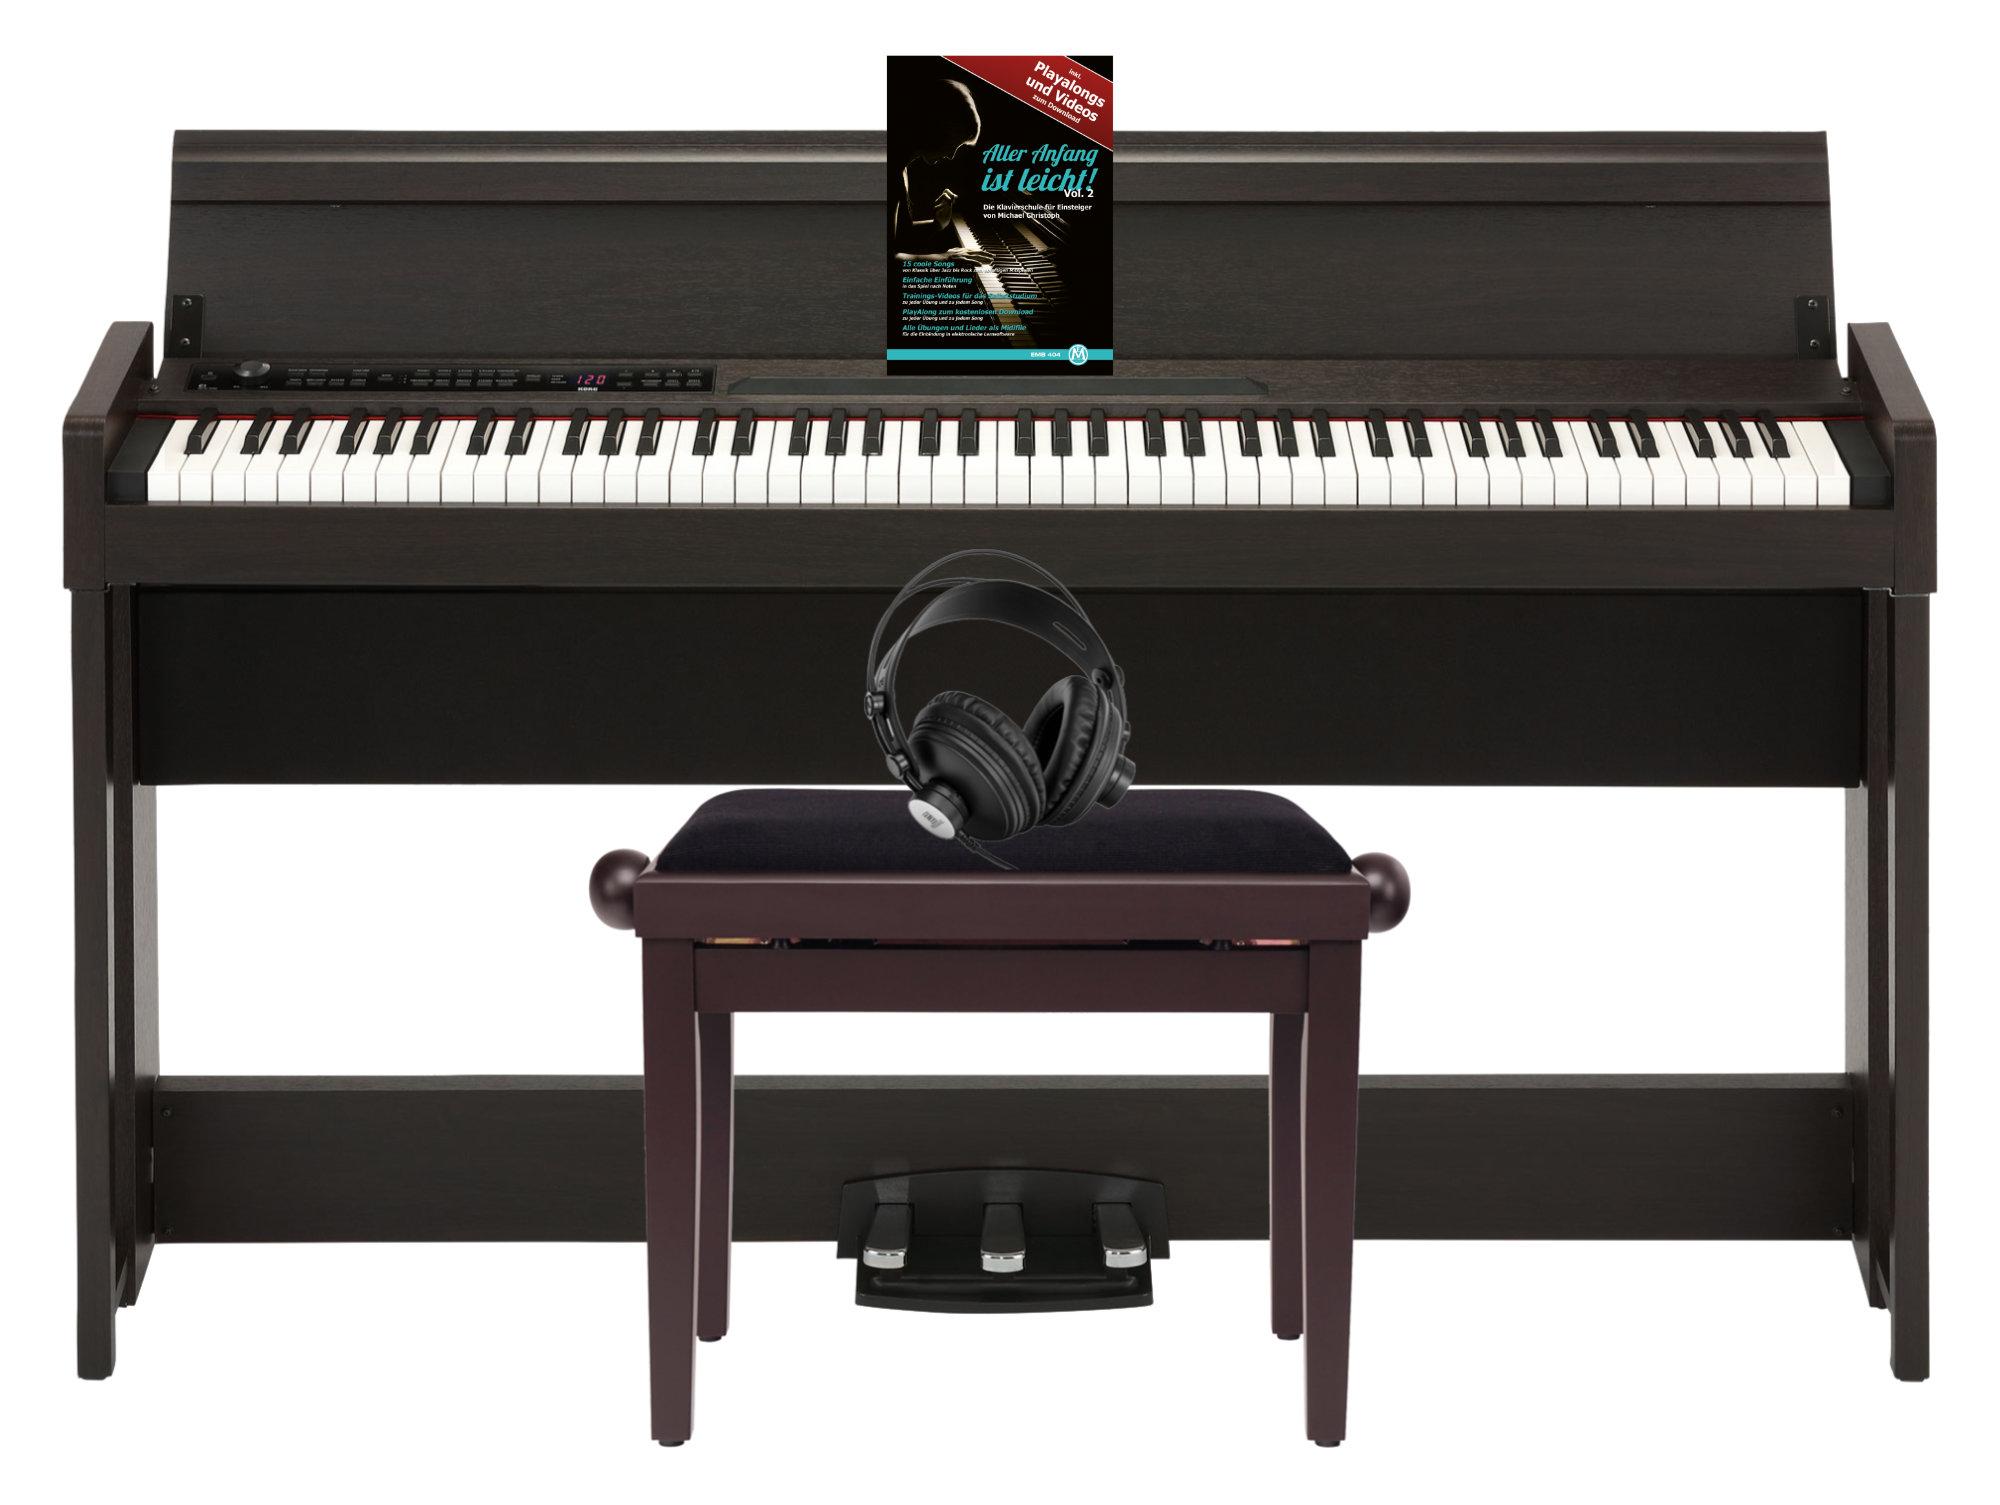 Digitalpianos - Korg C1 Air Digital Piano BR Home Set - Onlineshop Musikhaus Kirstein